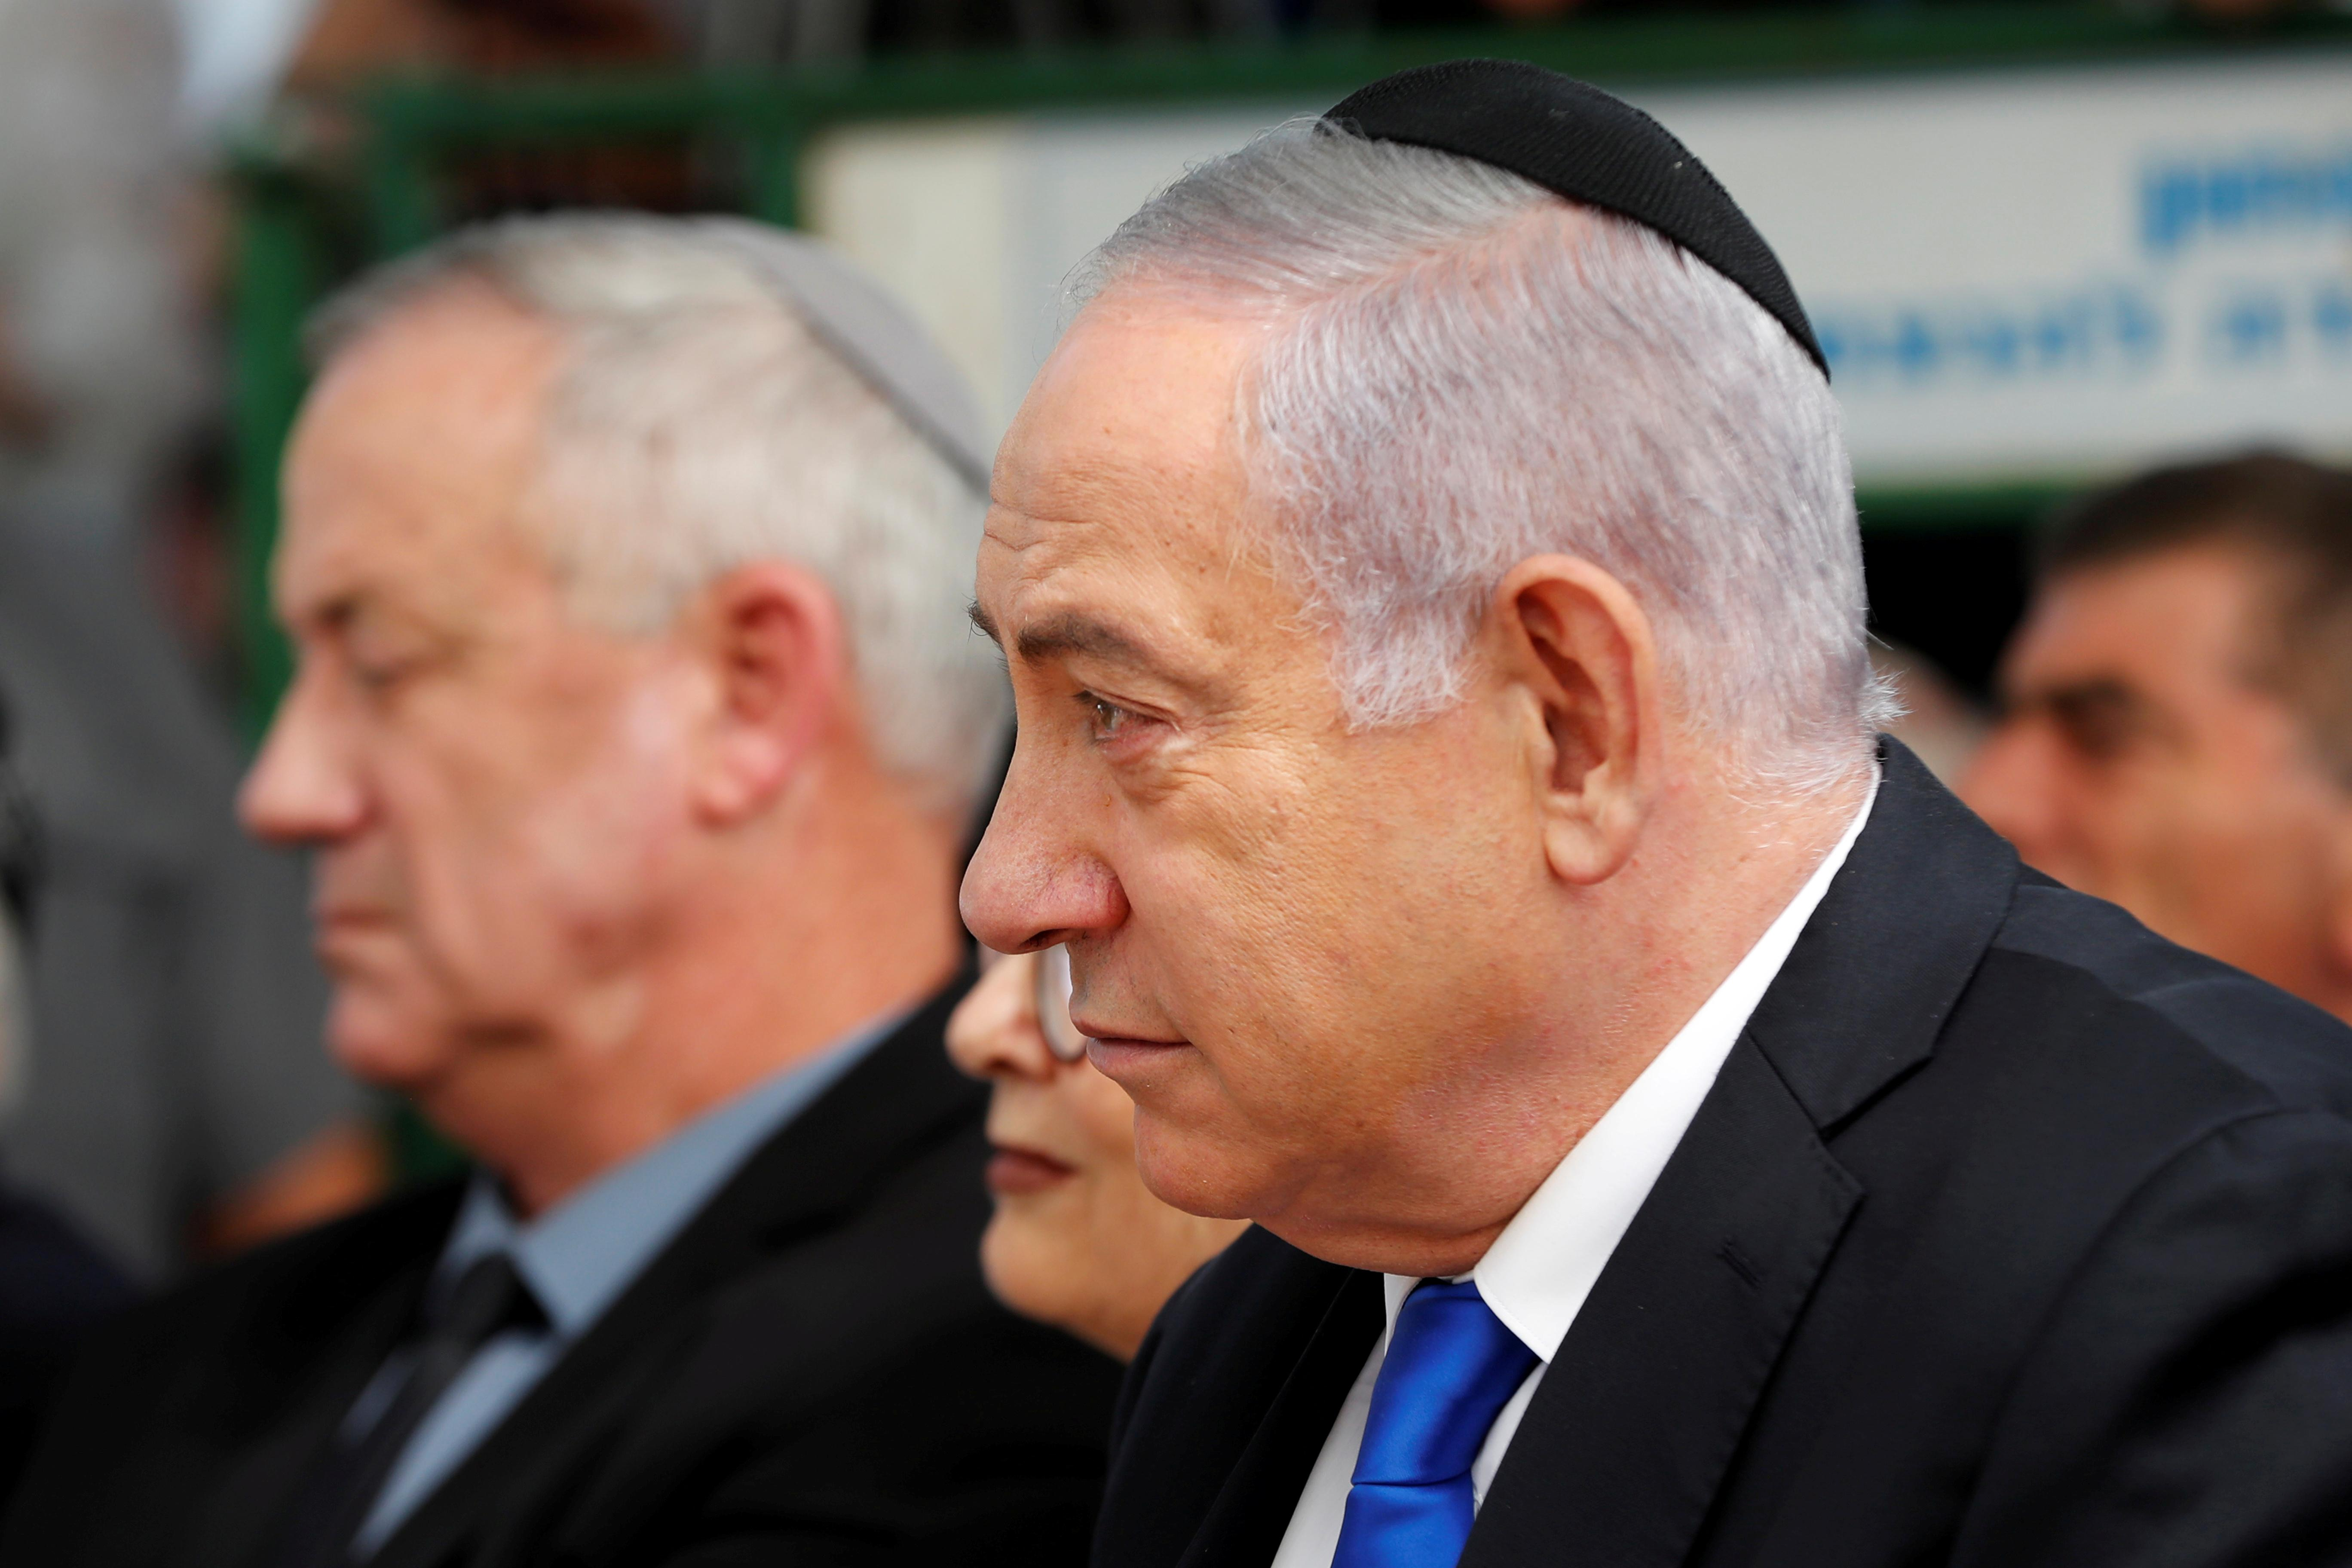 Israel's Netanyahu clings to power as coalition talks loom